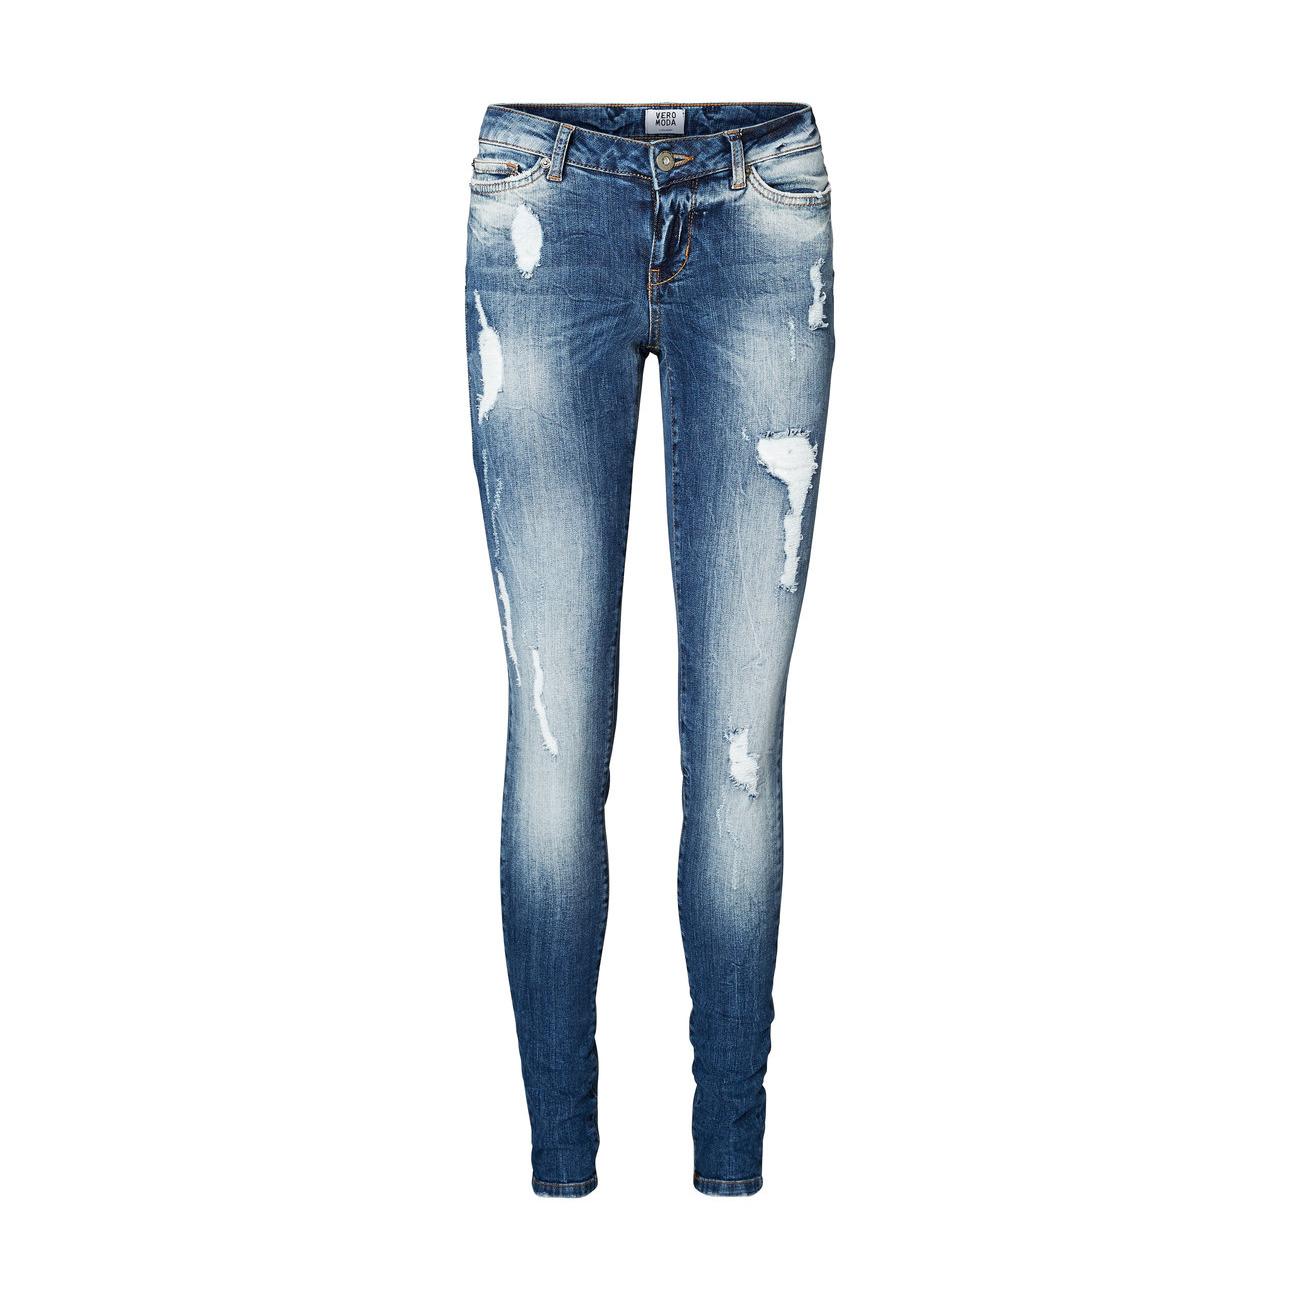 21 fede efterårs jeans   Woman.dk